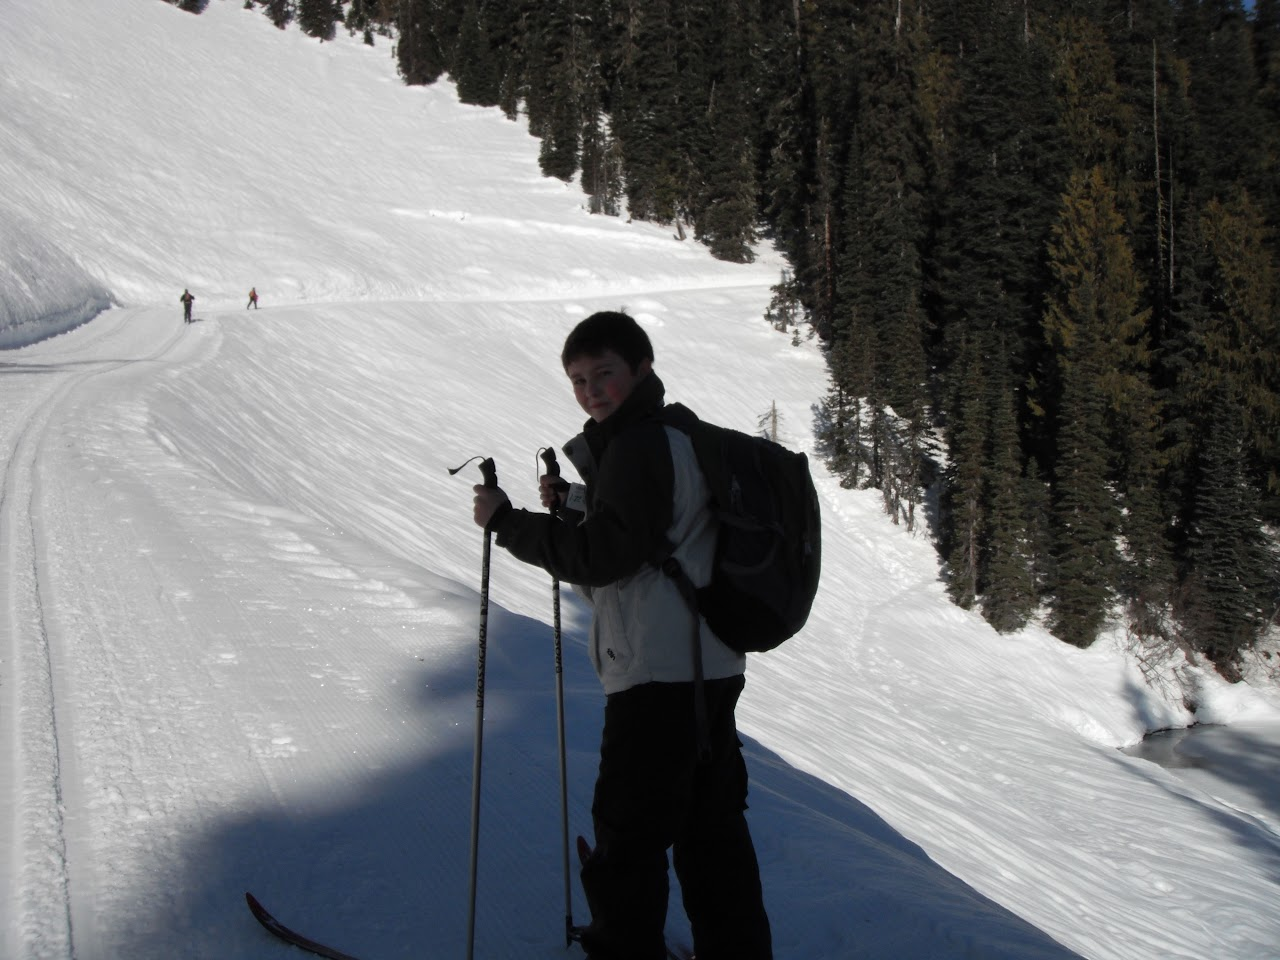 Cross Country Skiing - DSCF1538.JPG